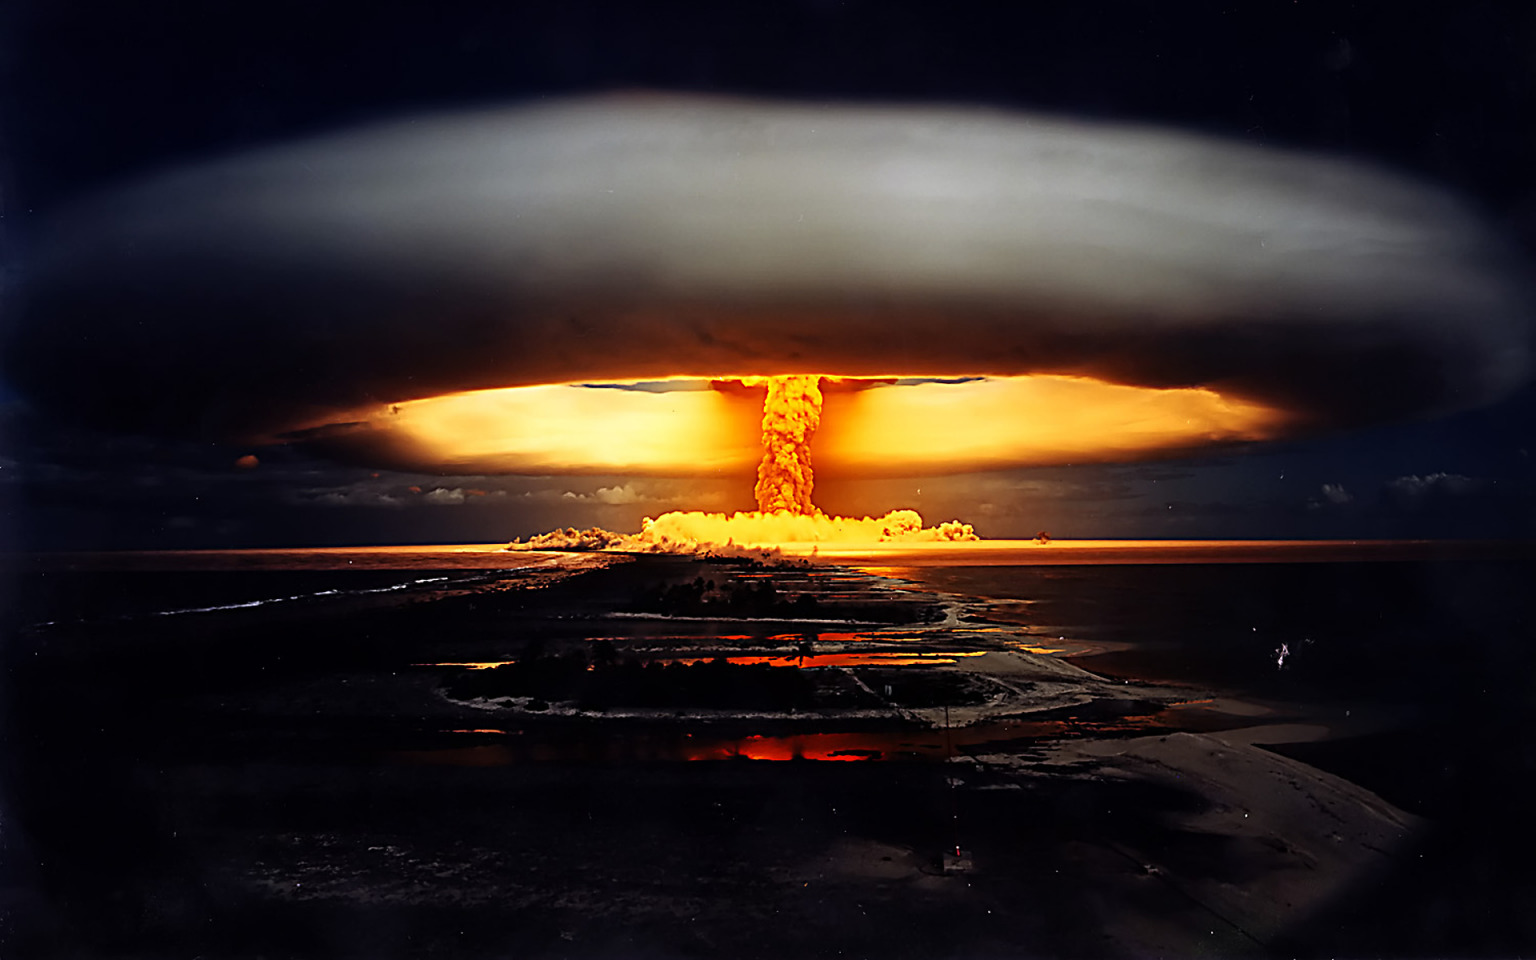 Explozie nuclear - Wikipedia